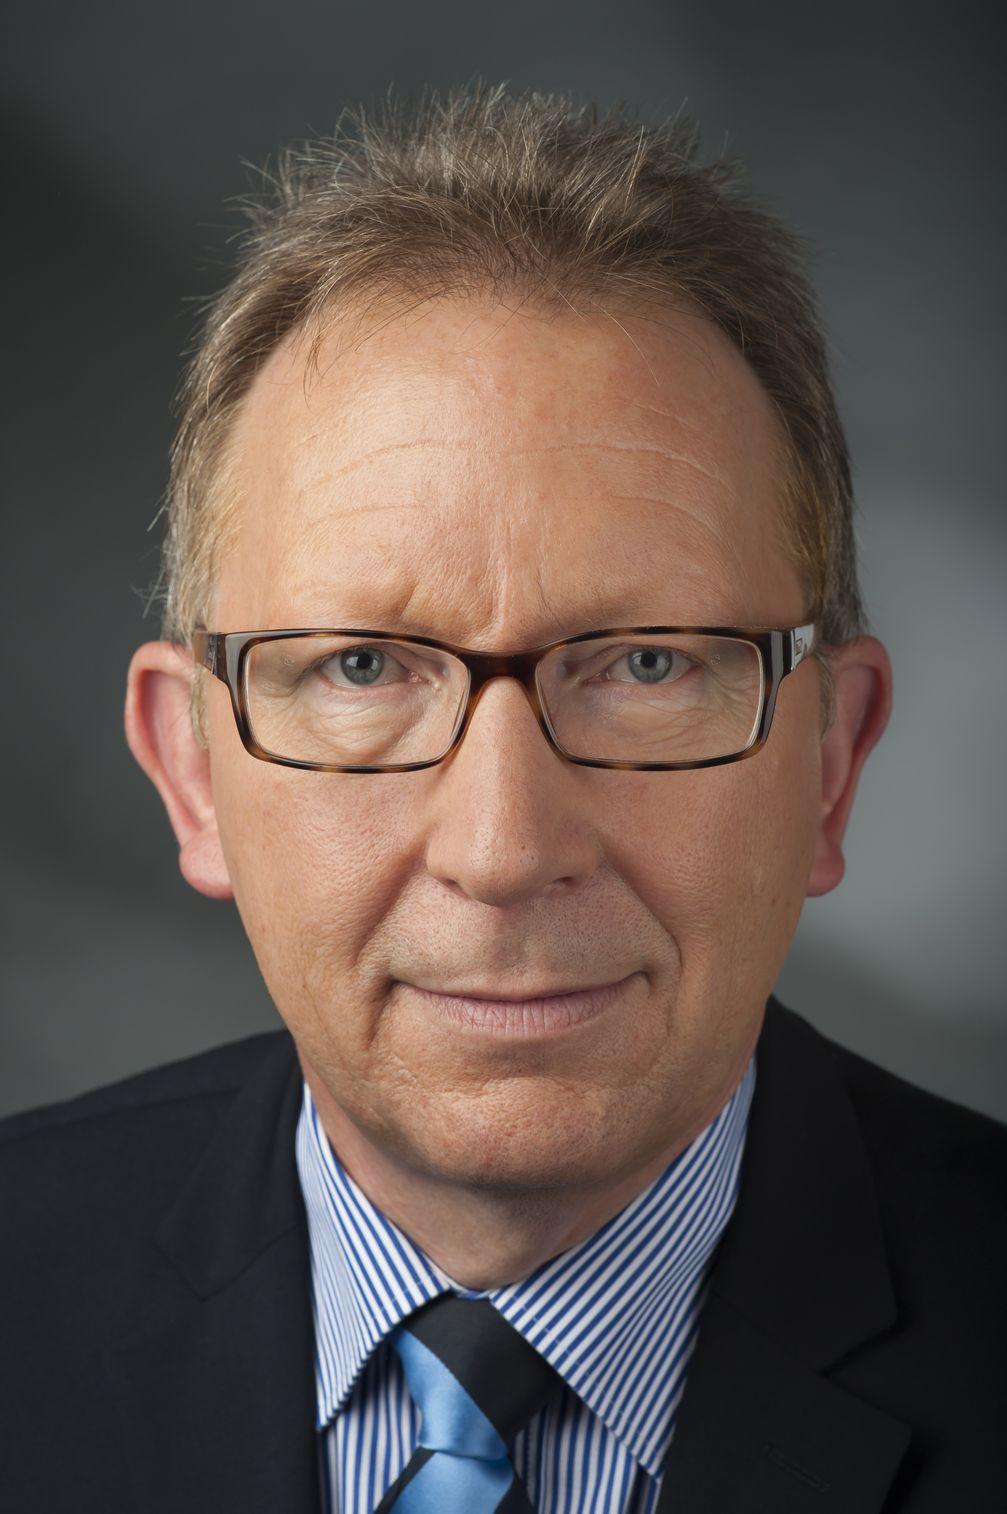 Erwin Rüddel  (2014), Archivbild